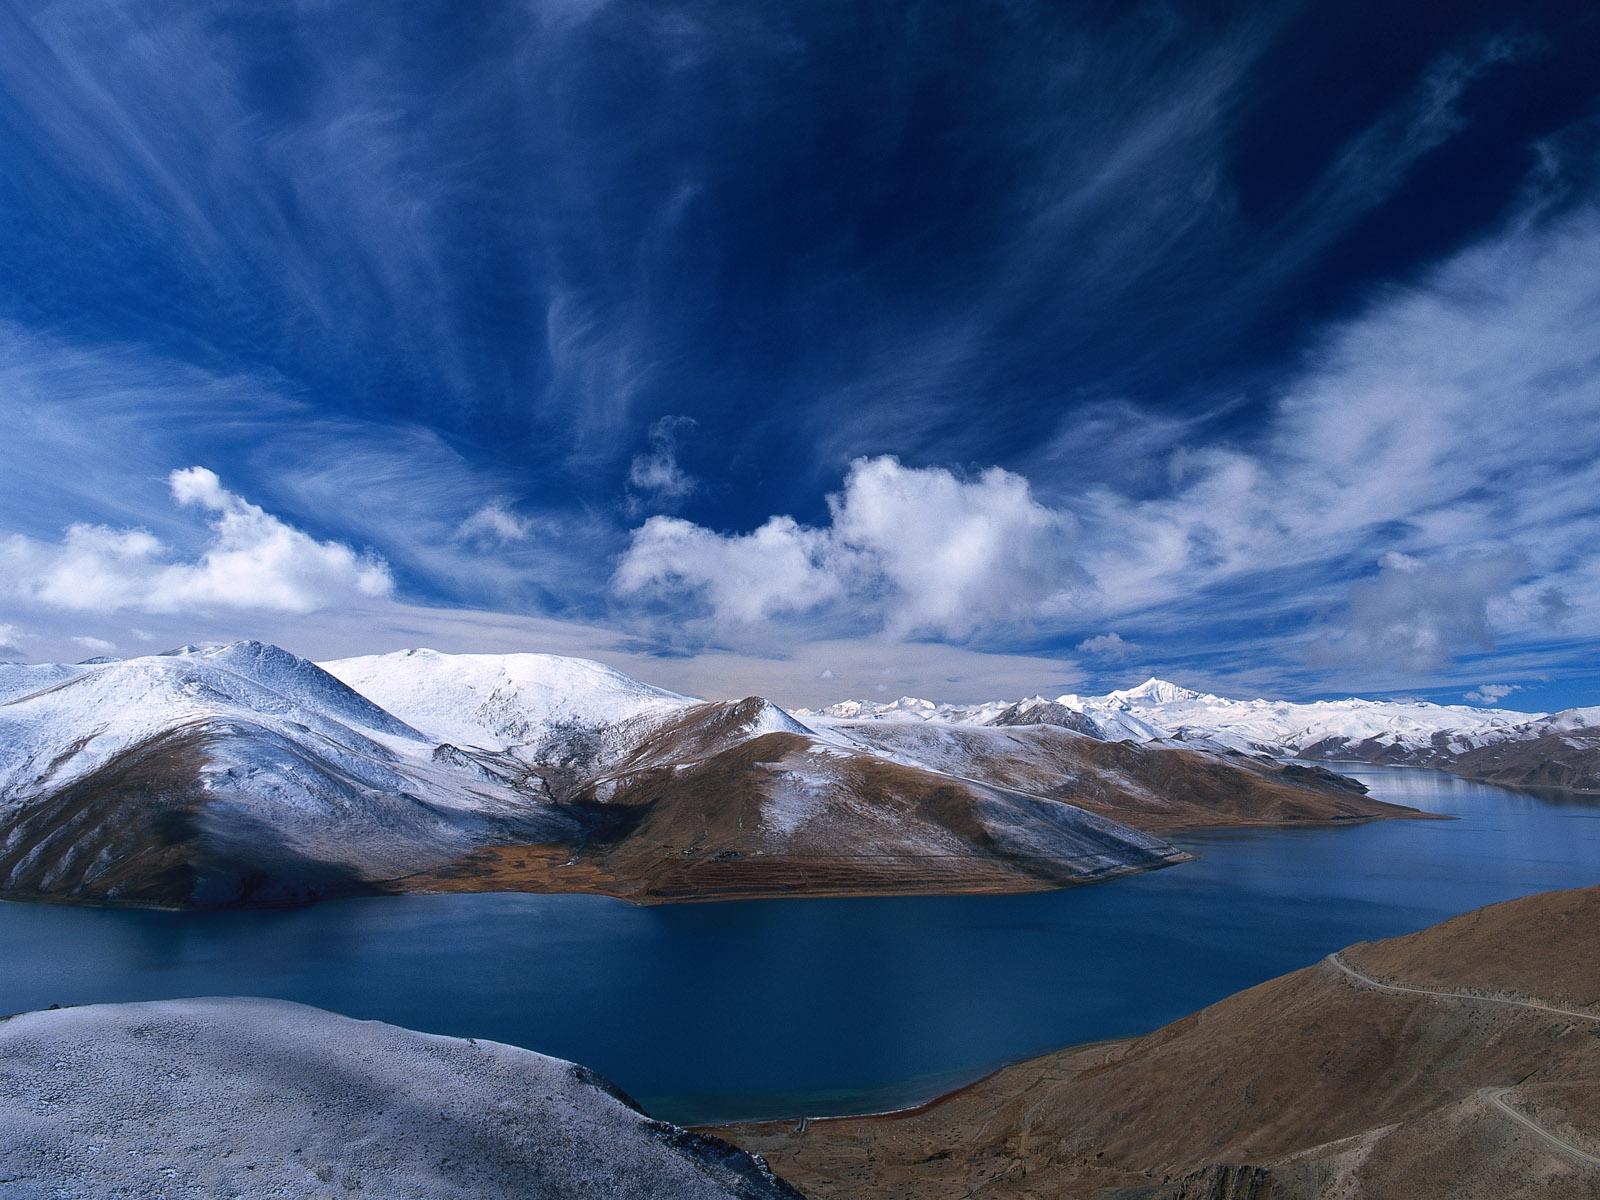 Most Inspiring Wallpaper Mountain Water - BlueSky-Water-Mountains  Collection_806856.jpg